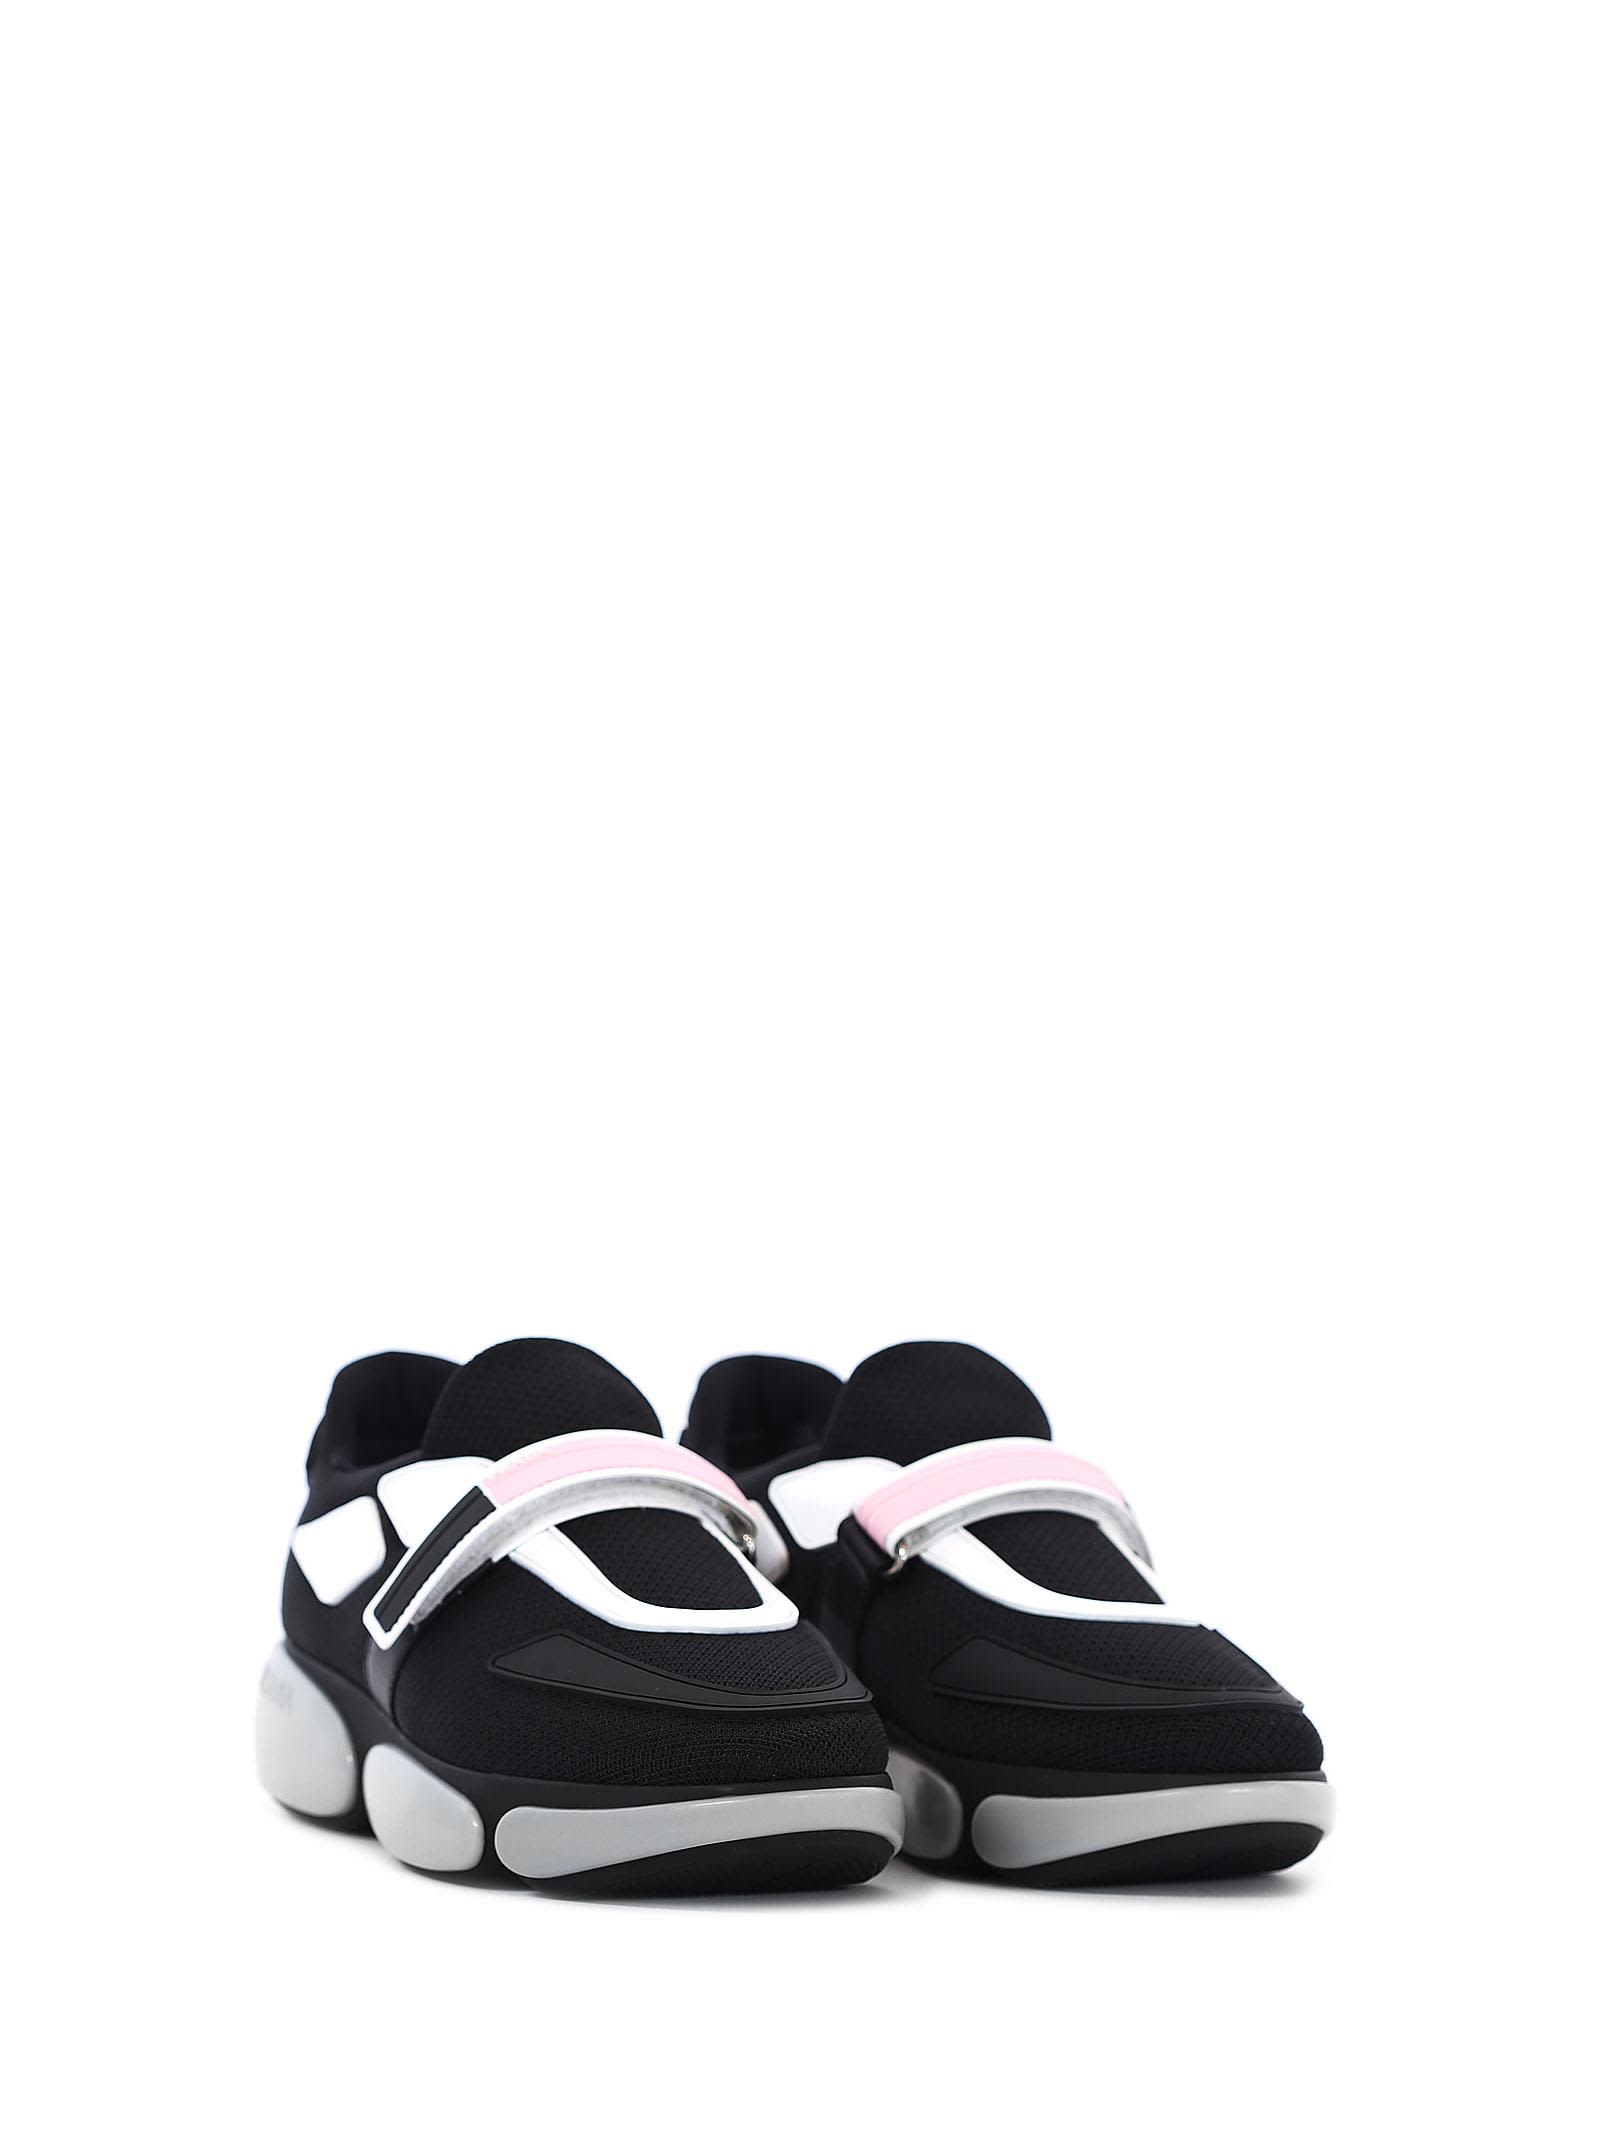 Cloudbust fabric sneakers Prada ZqtVFLuQ